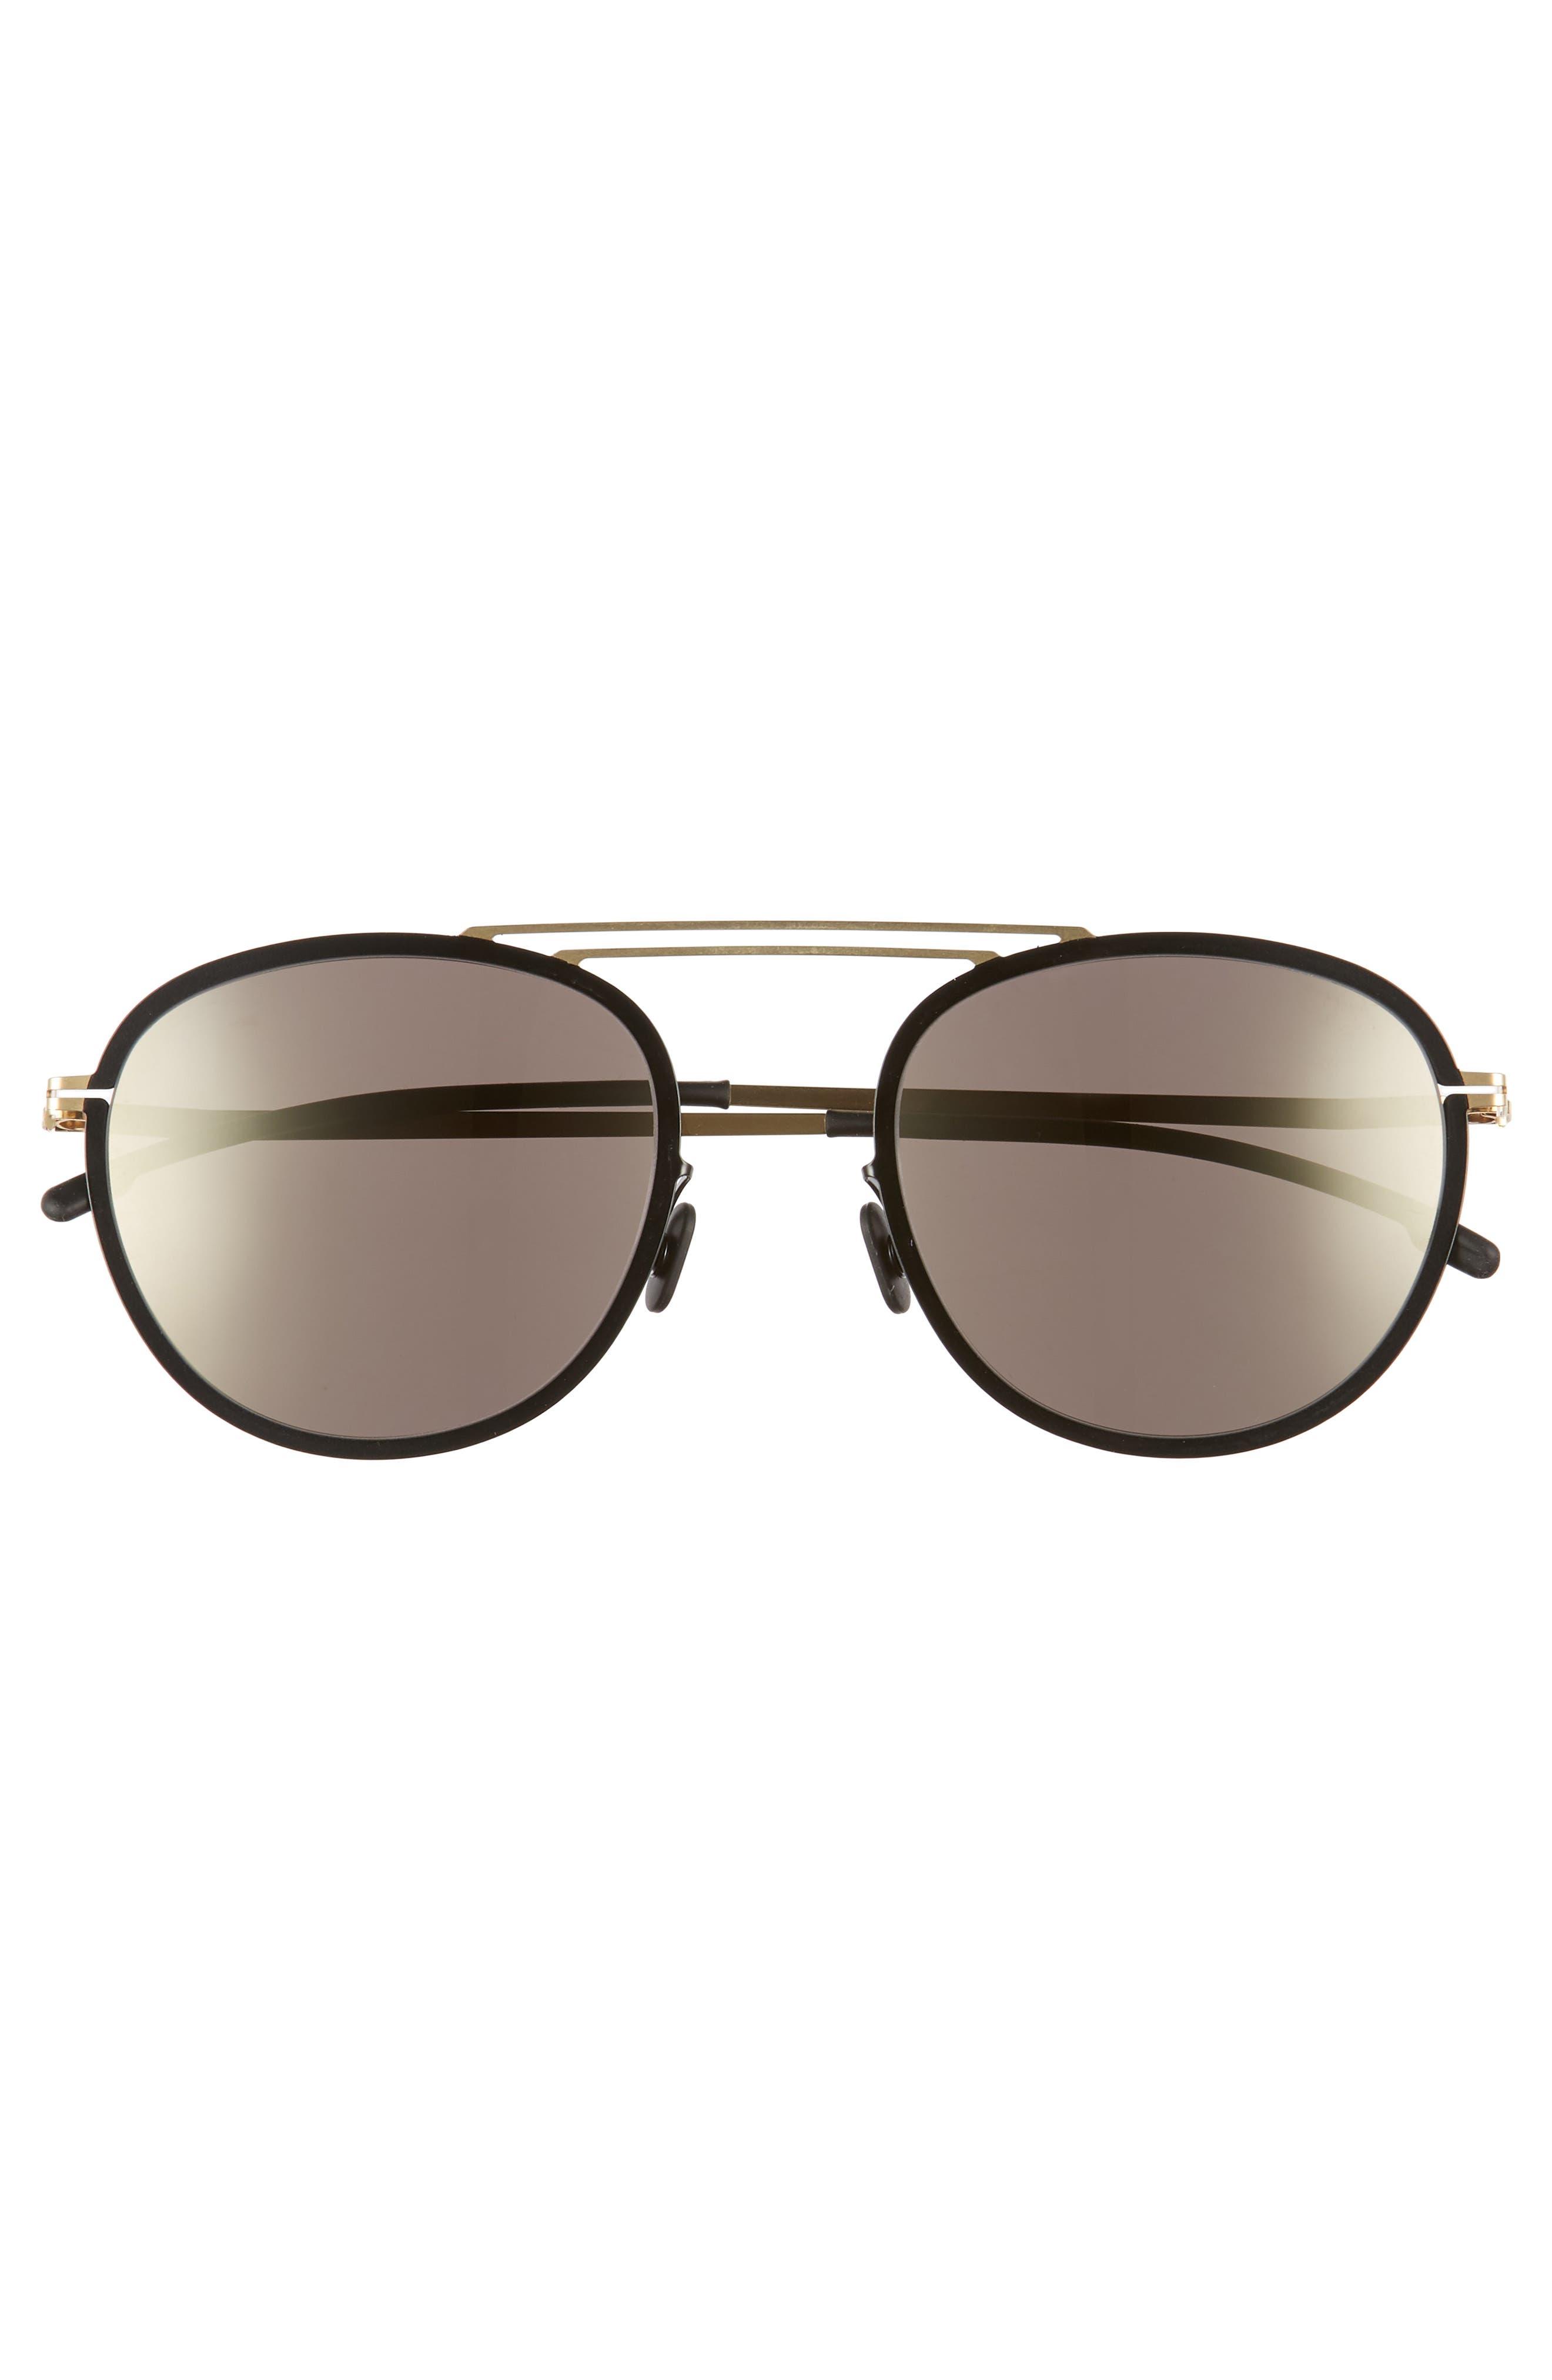 Luigi 52mm Aviator Sunglasses,                             Alternate thumbnail 2, color,